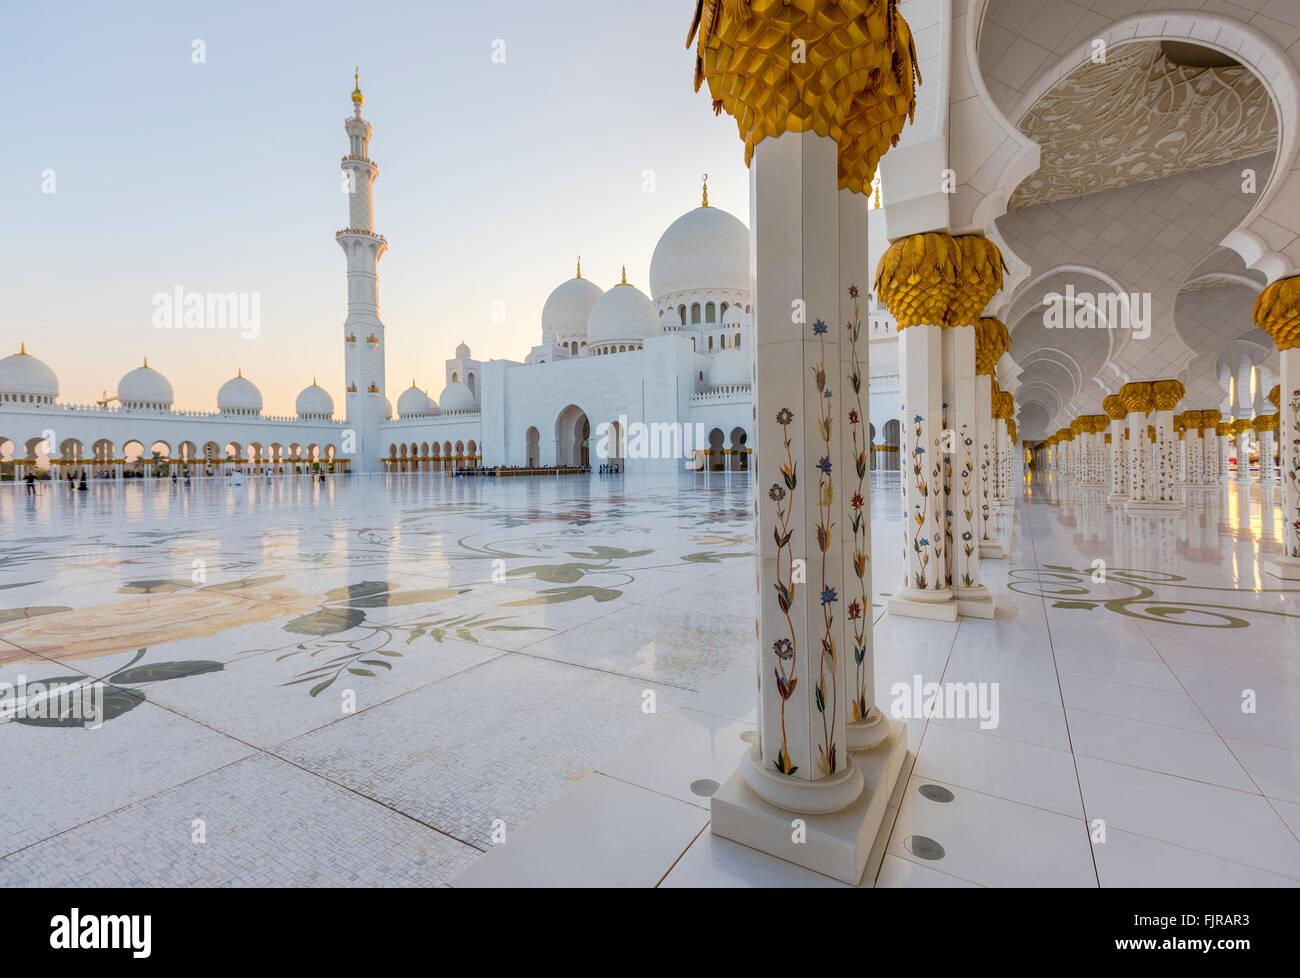 Courtyard of the Sheikh Zayed Mosque, Sheikh Zayed Grand Mosque, Abu Dhabi, Emirate of Abu Dhabi, United Arab Emirates - Stock Image